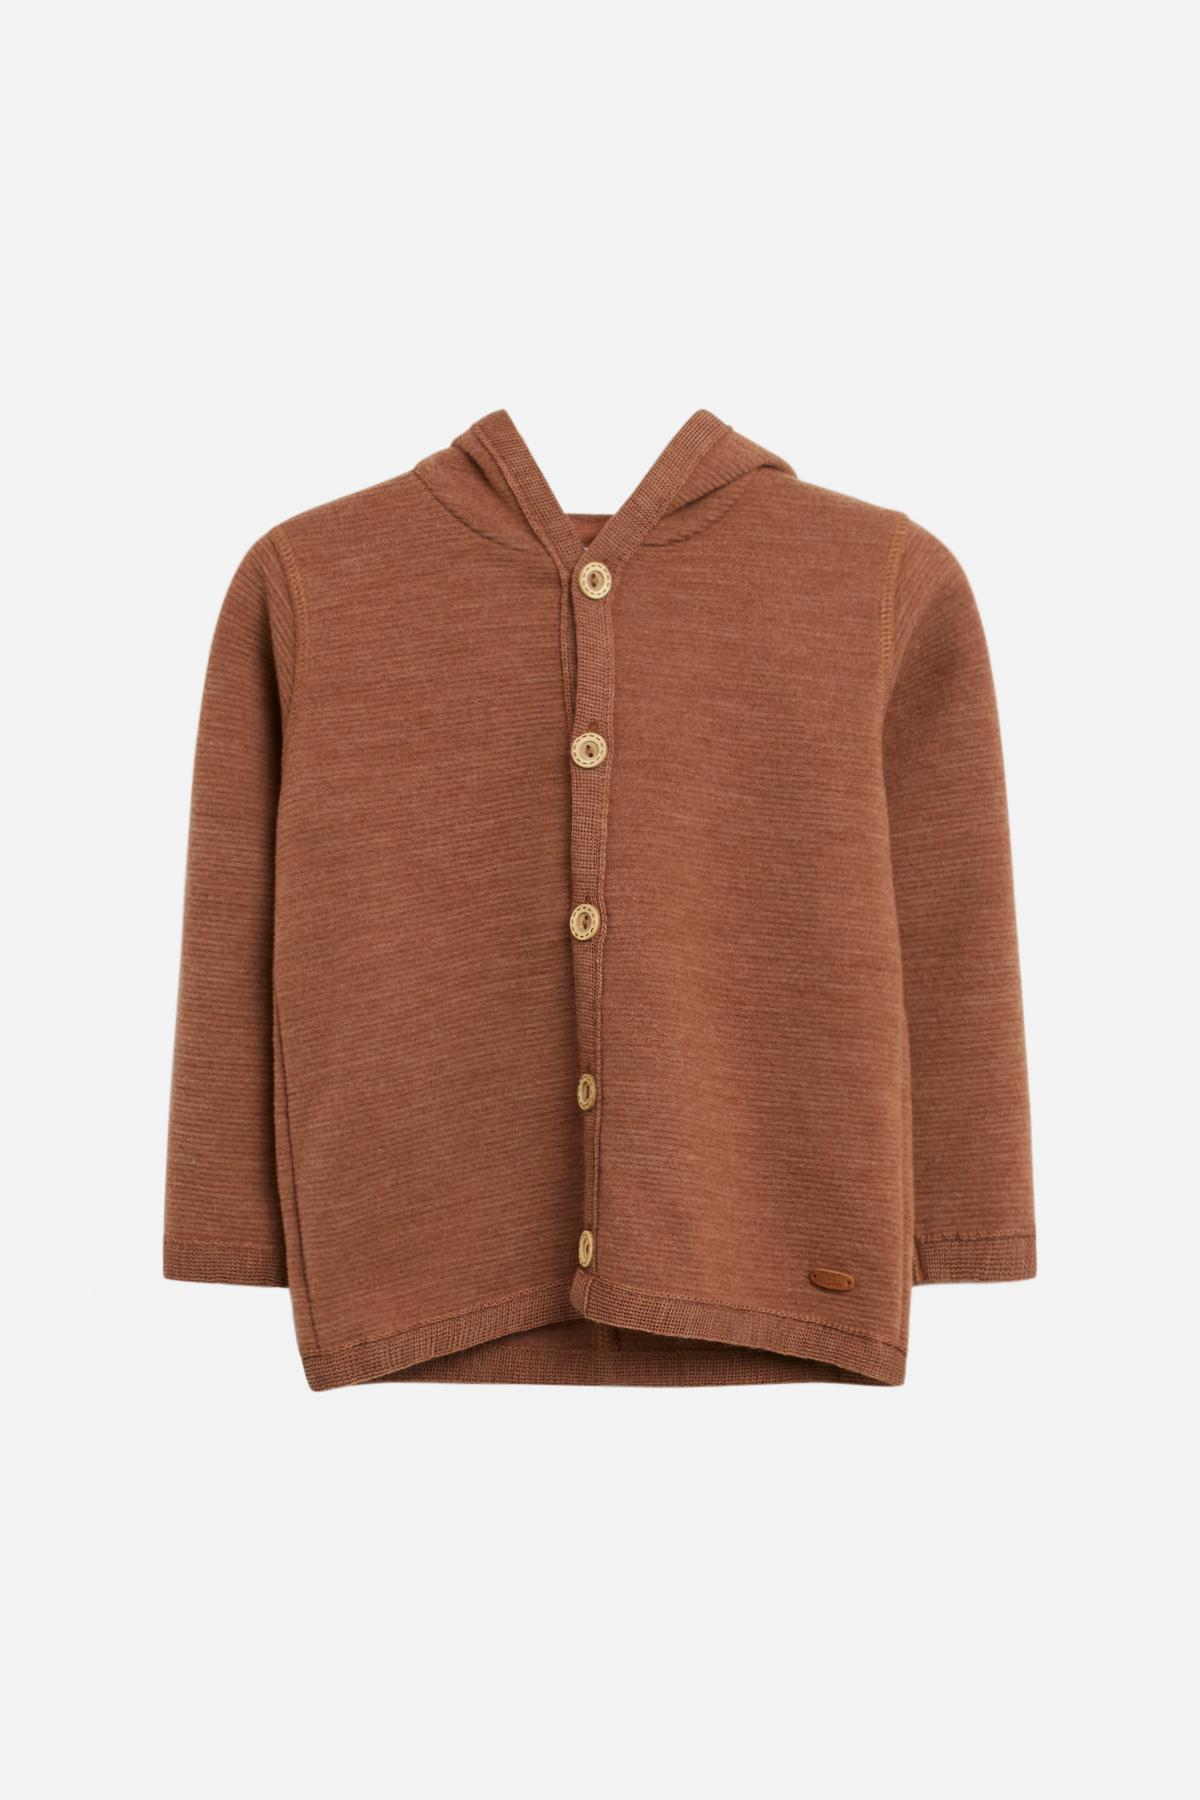 Wool Merino - Ebba - Indoor Jacket